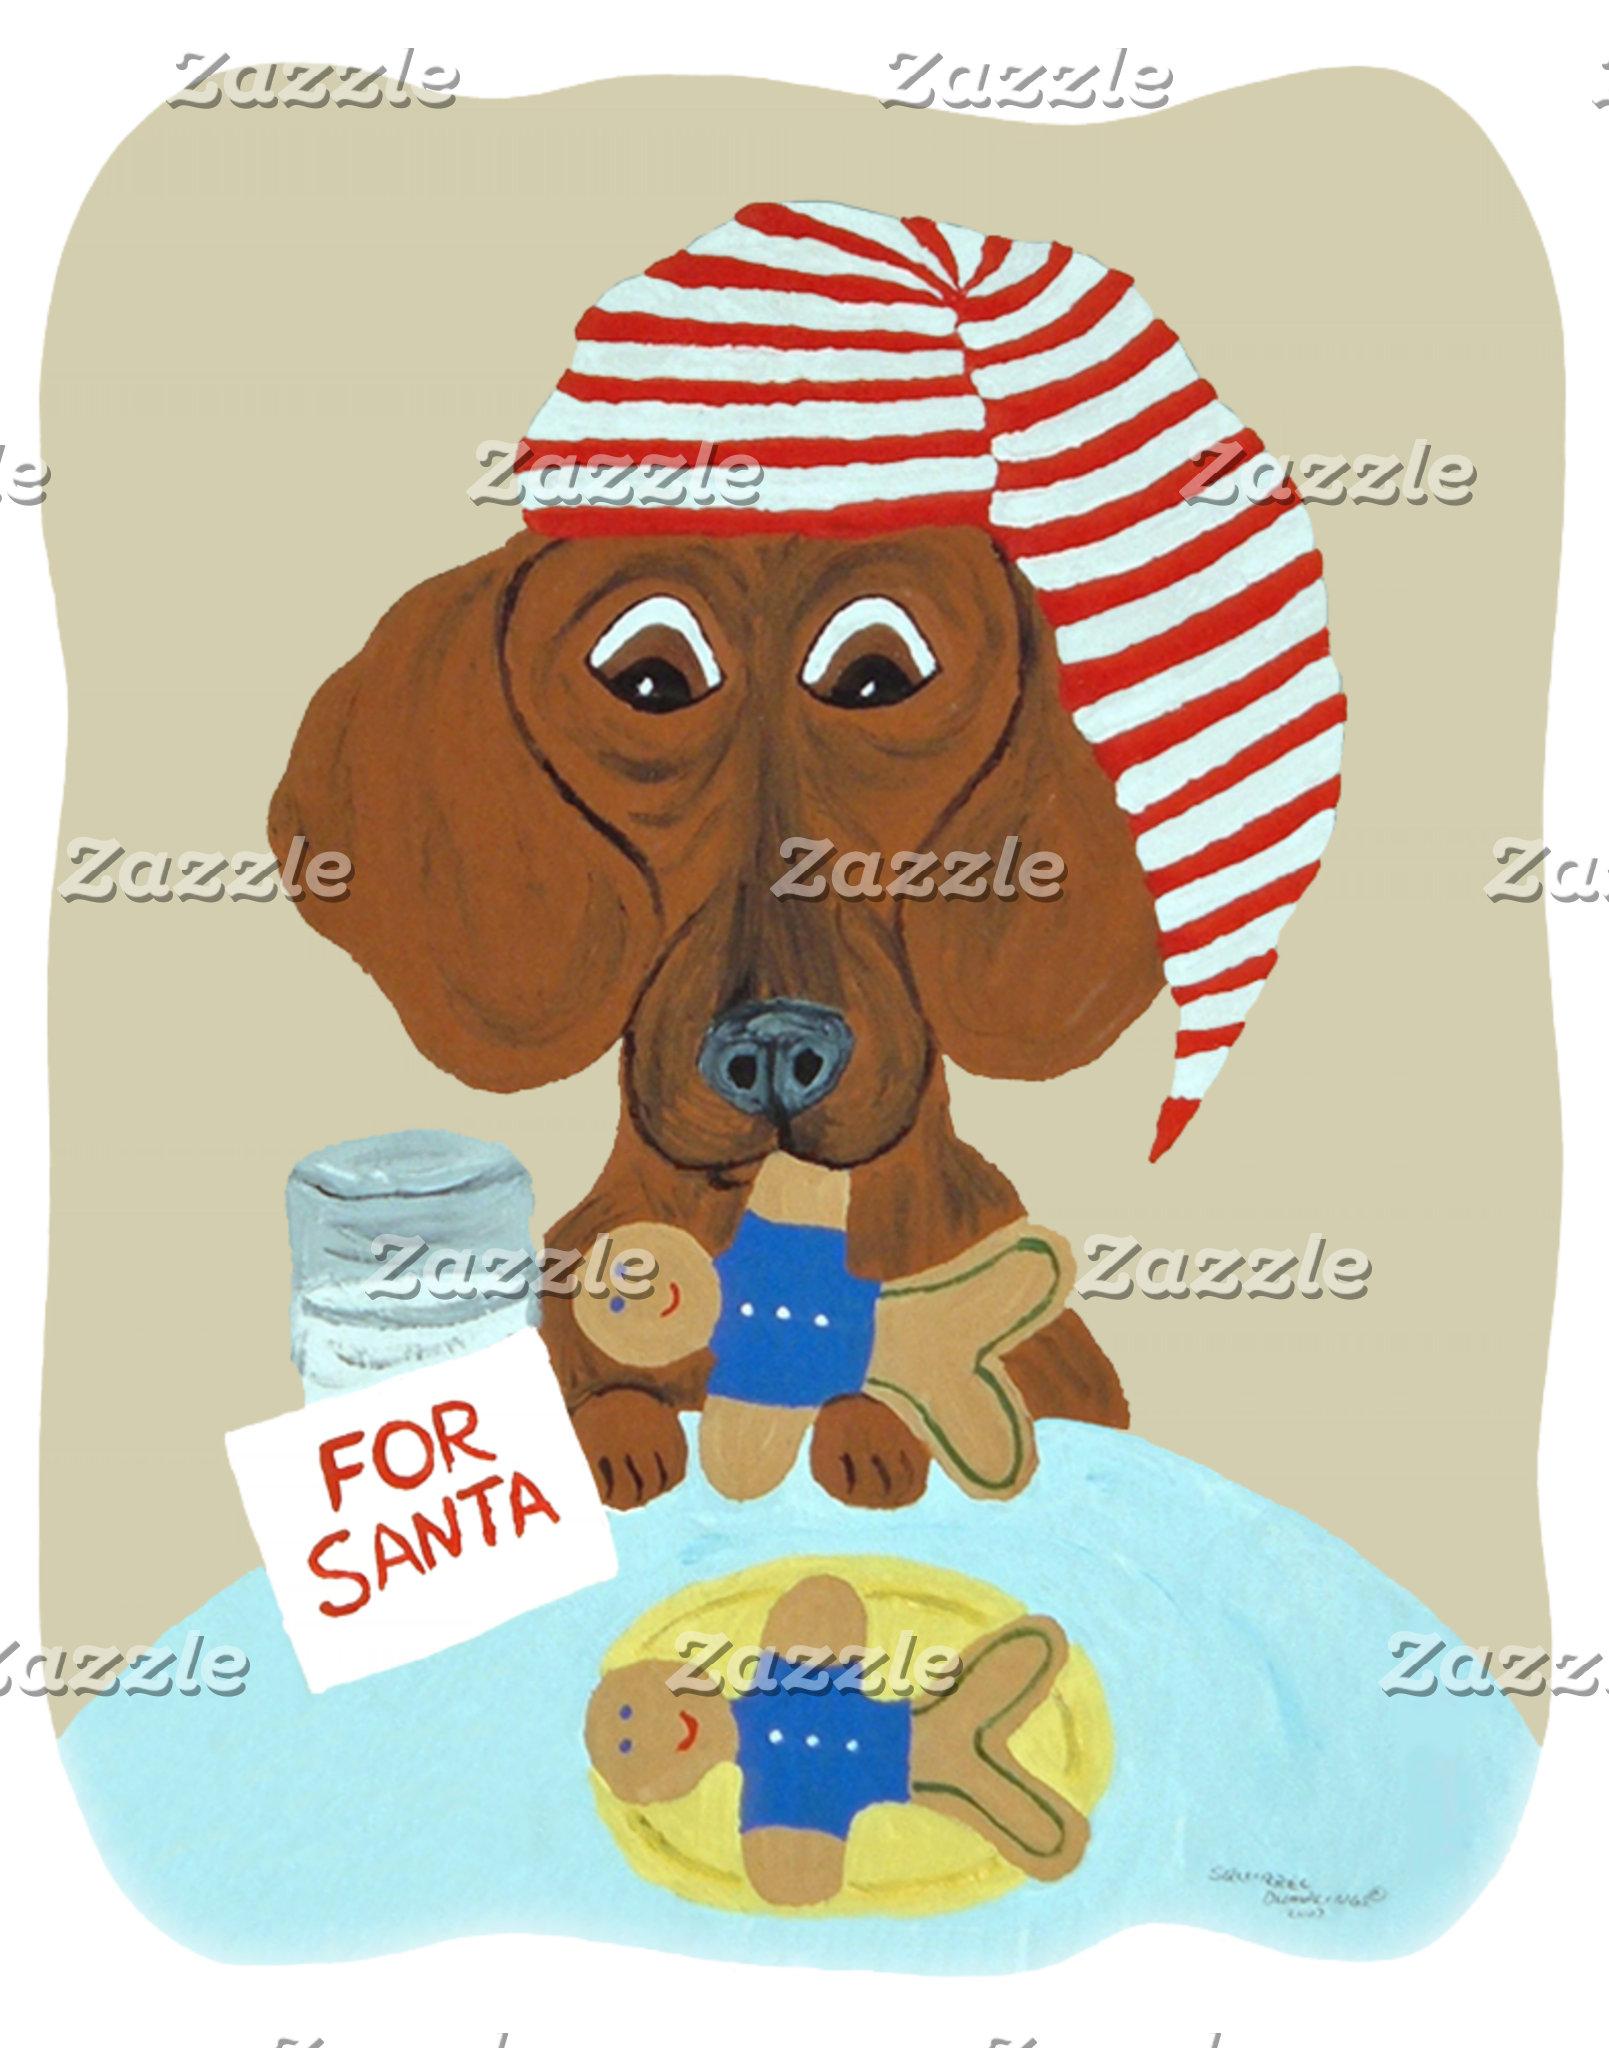 Dachshund Guarding Santa's Cookies